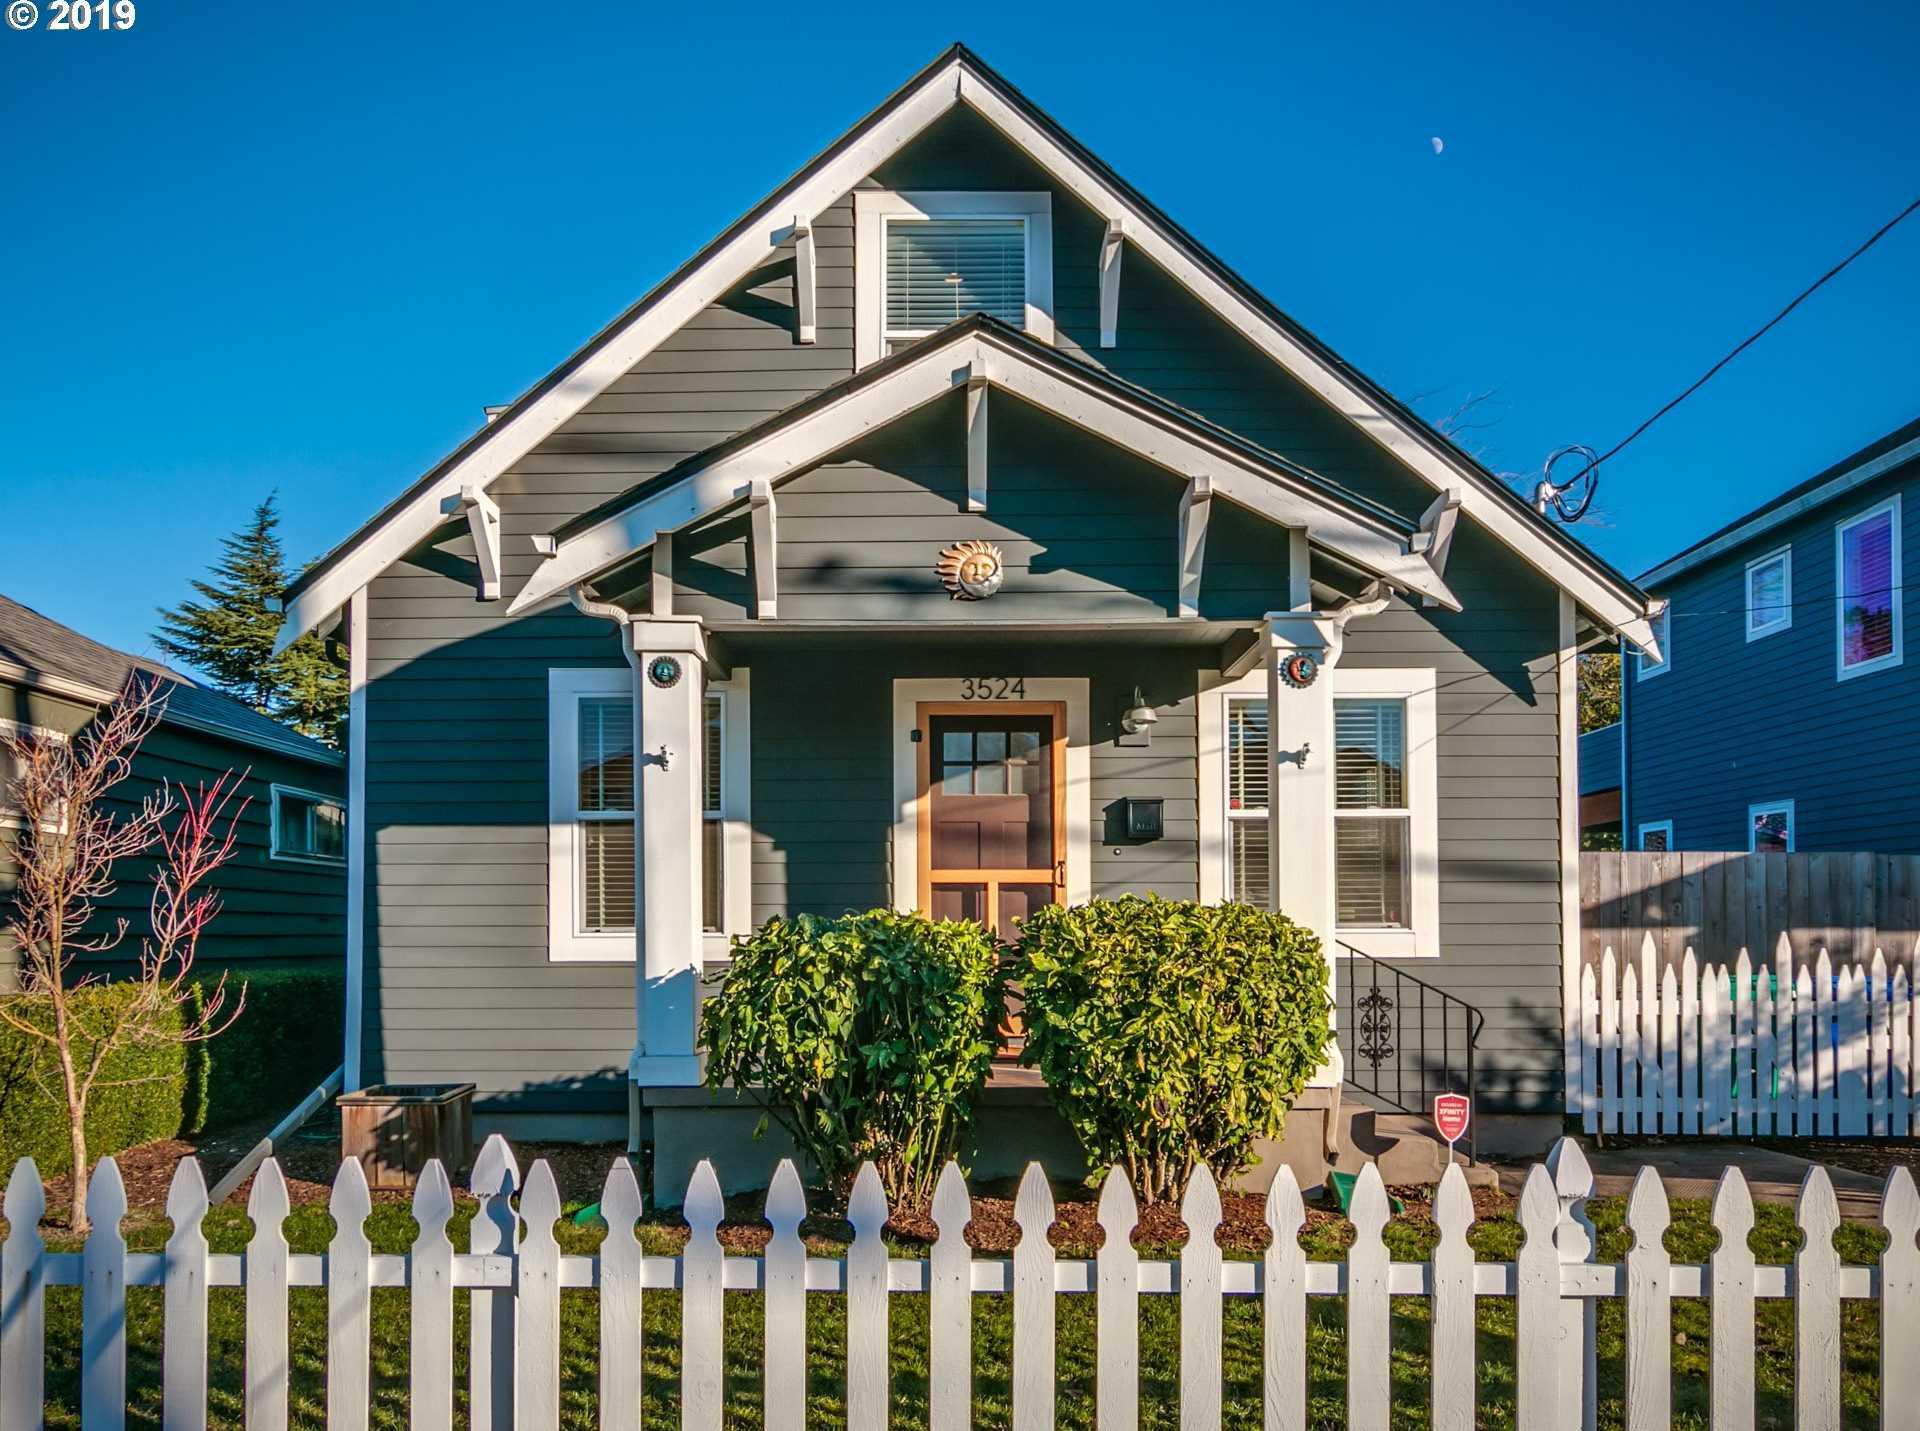 $499,950 - 3Br/3Ba -  for Sale in Foster - Powell, Portland